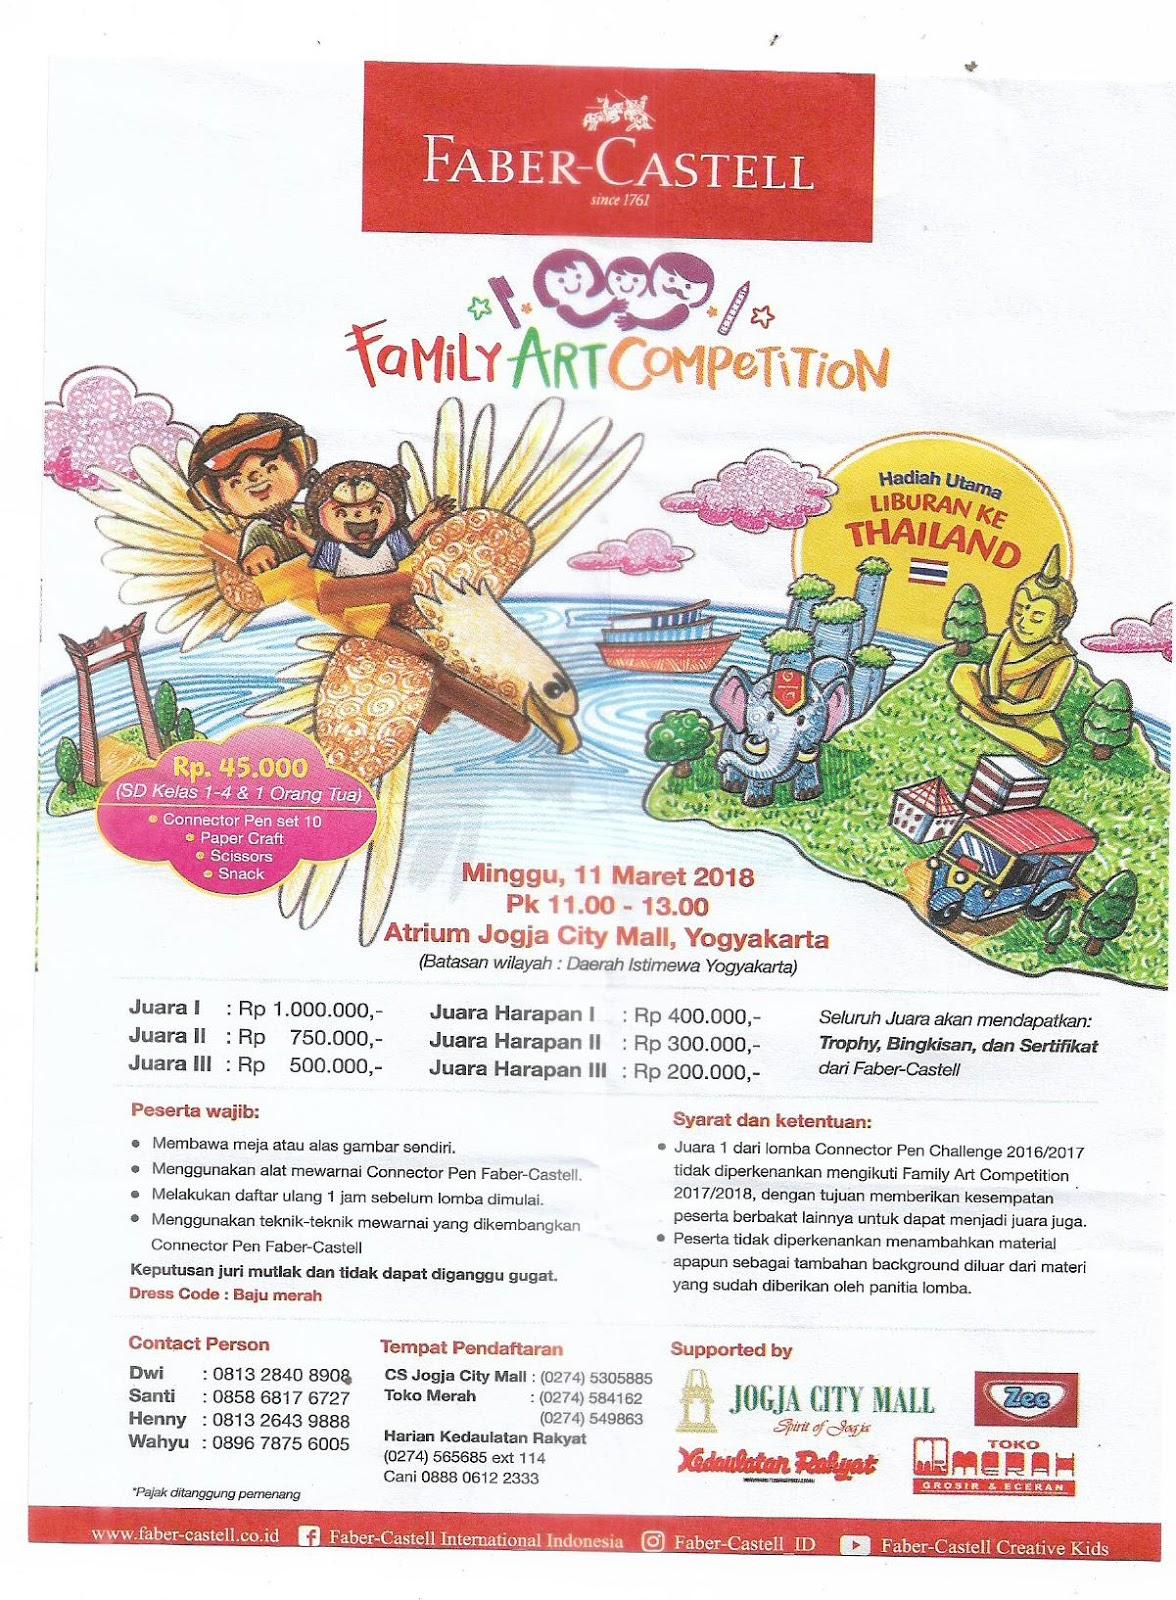 Lomba Mewarnai Fabel Castel Jogja City Mall 11 Maret 2018 Mom S